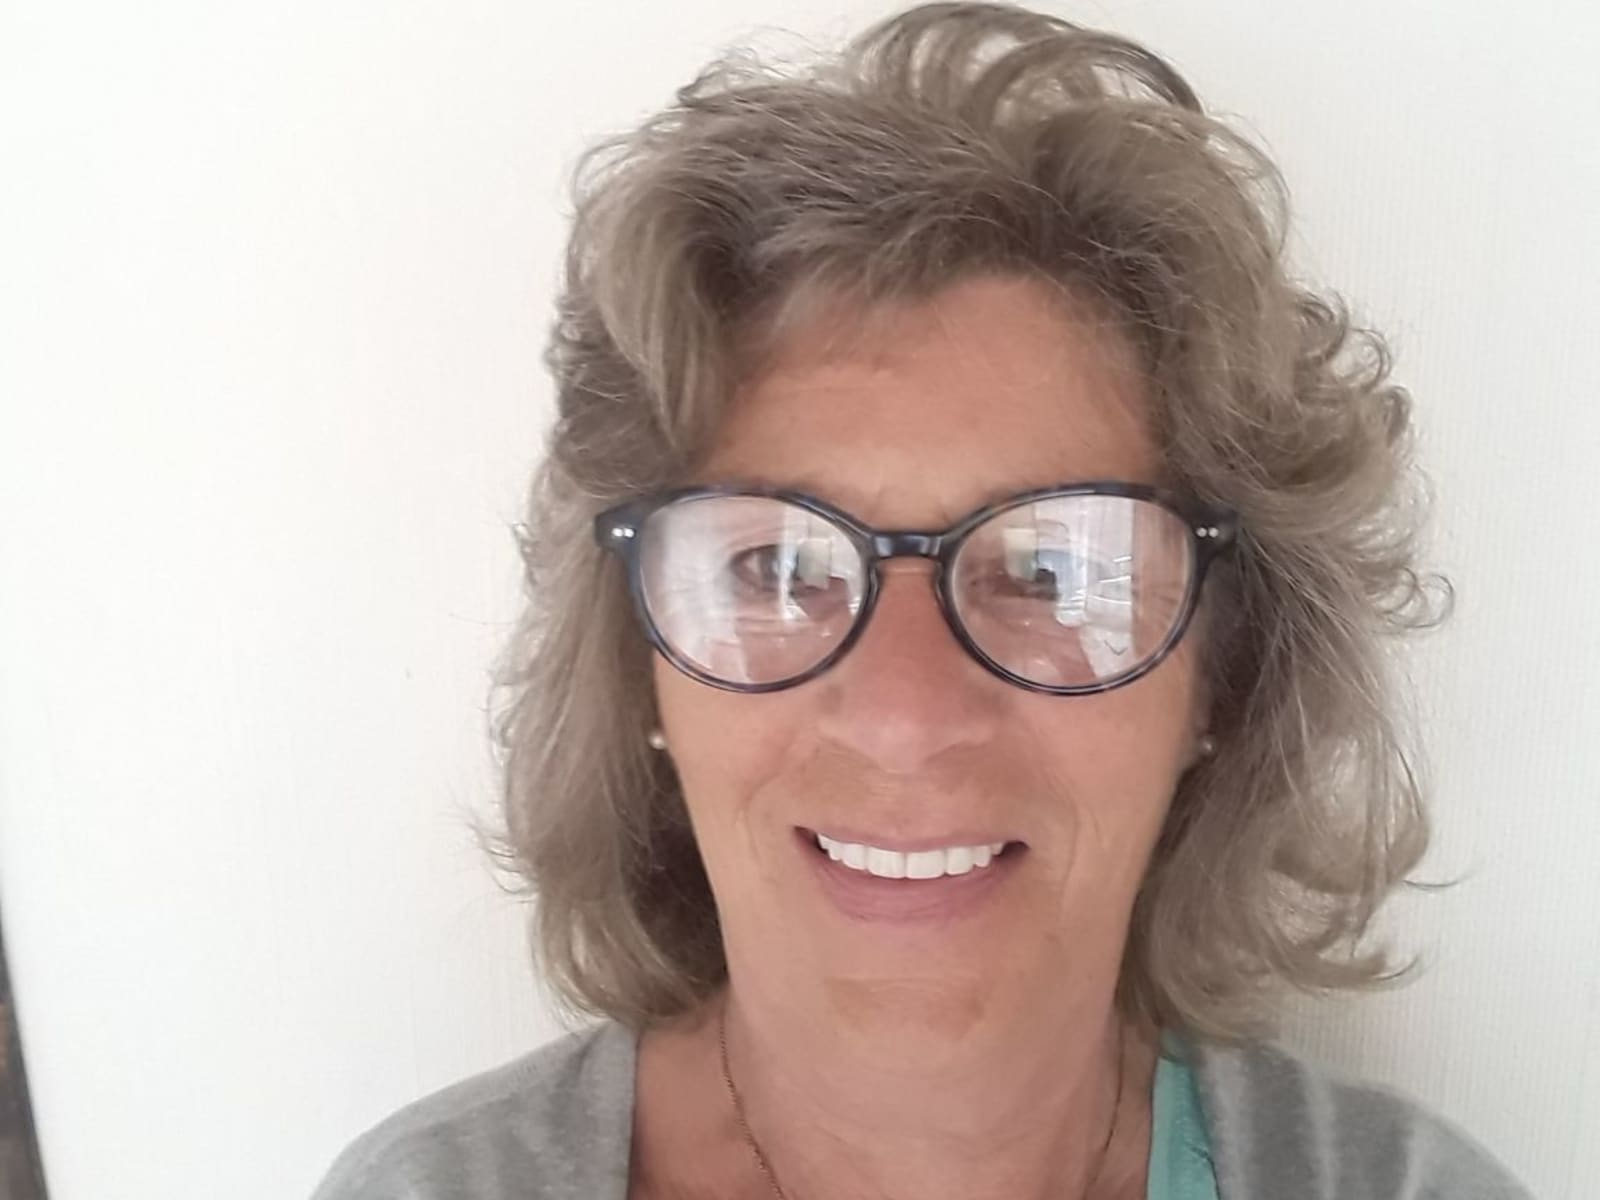 Gudrun from Portland, Oregon, United States